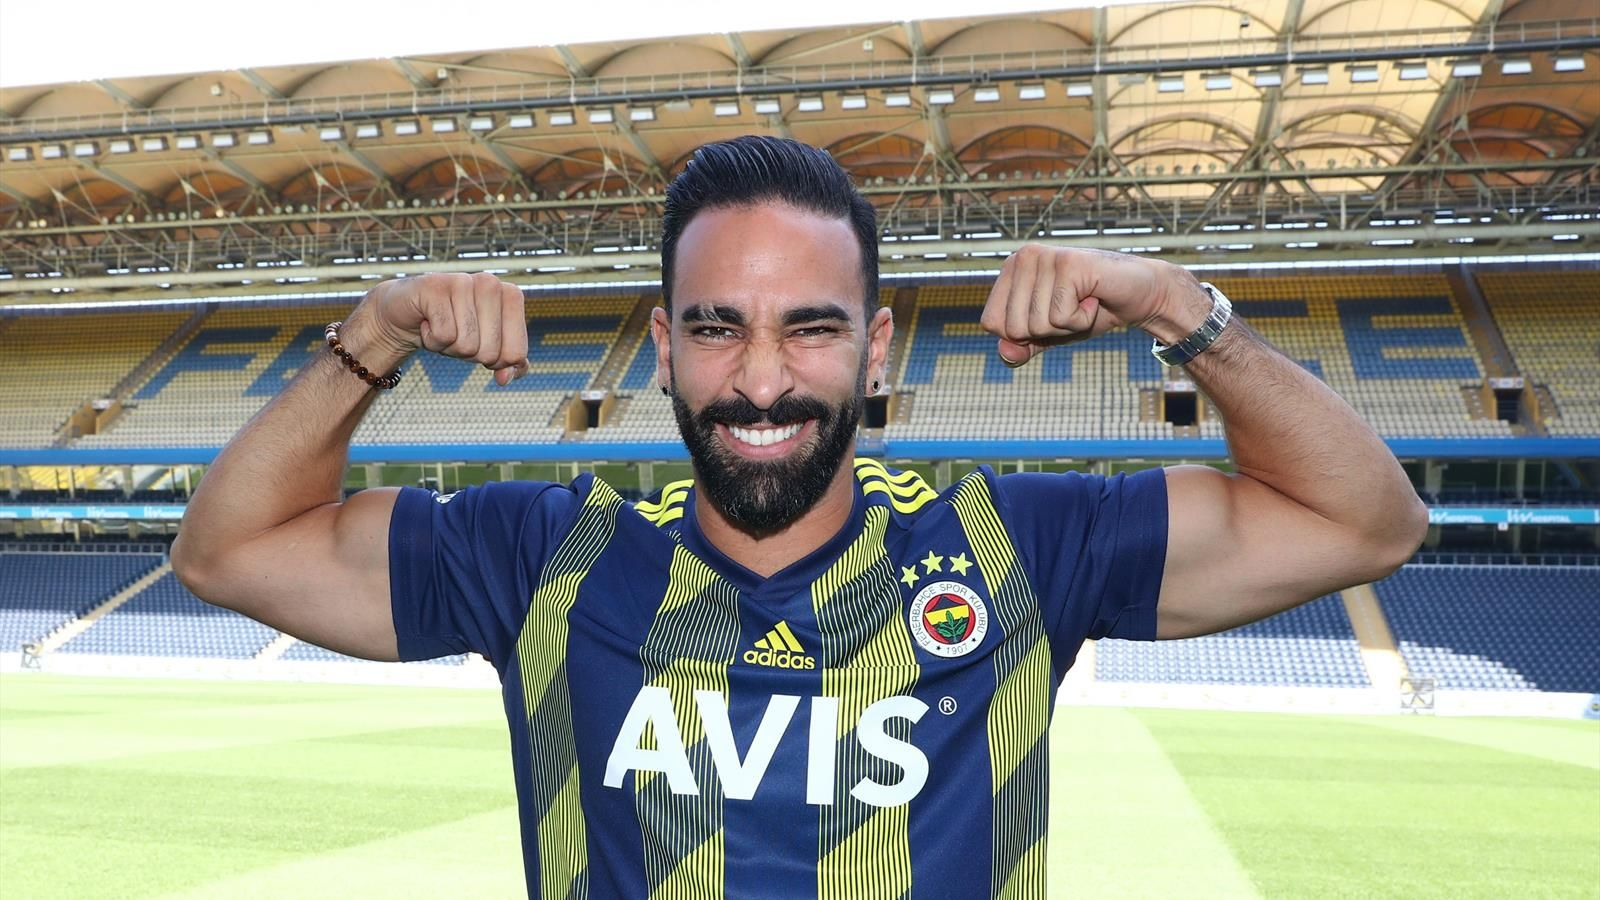 Mercato : Adil Rami (ex Fenerbahçe) rejoint le FC Sotchi (Russie)